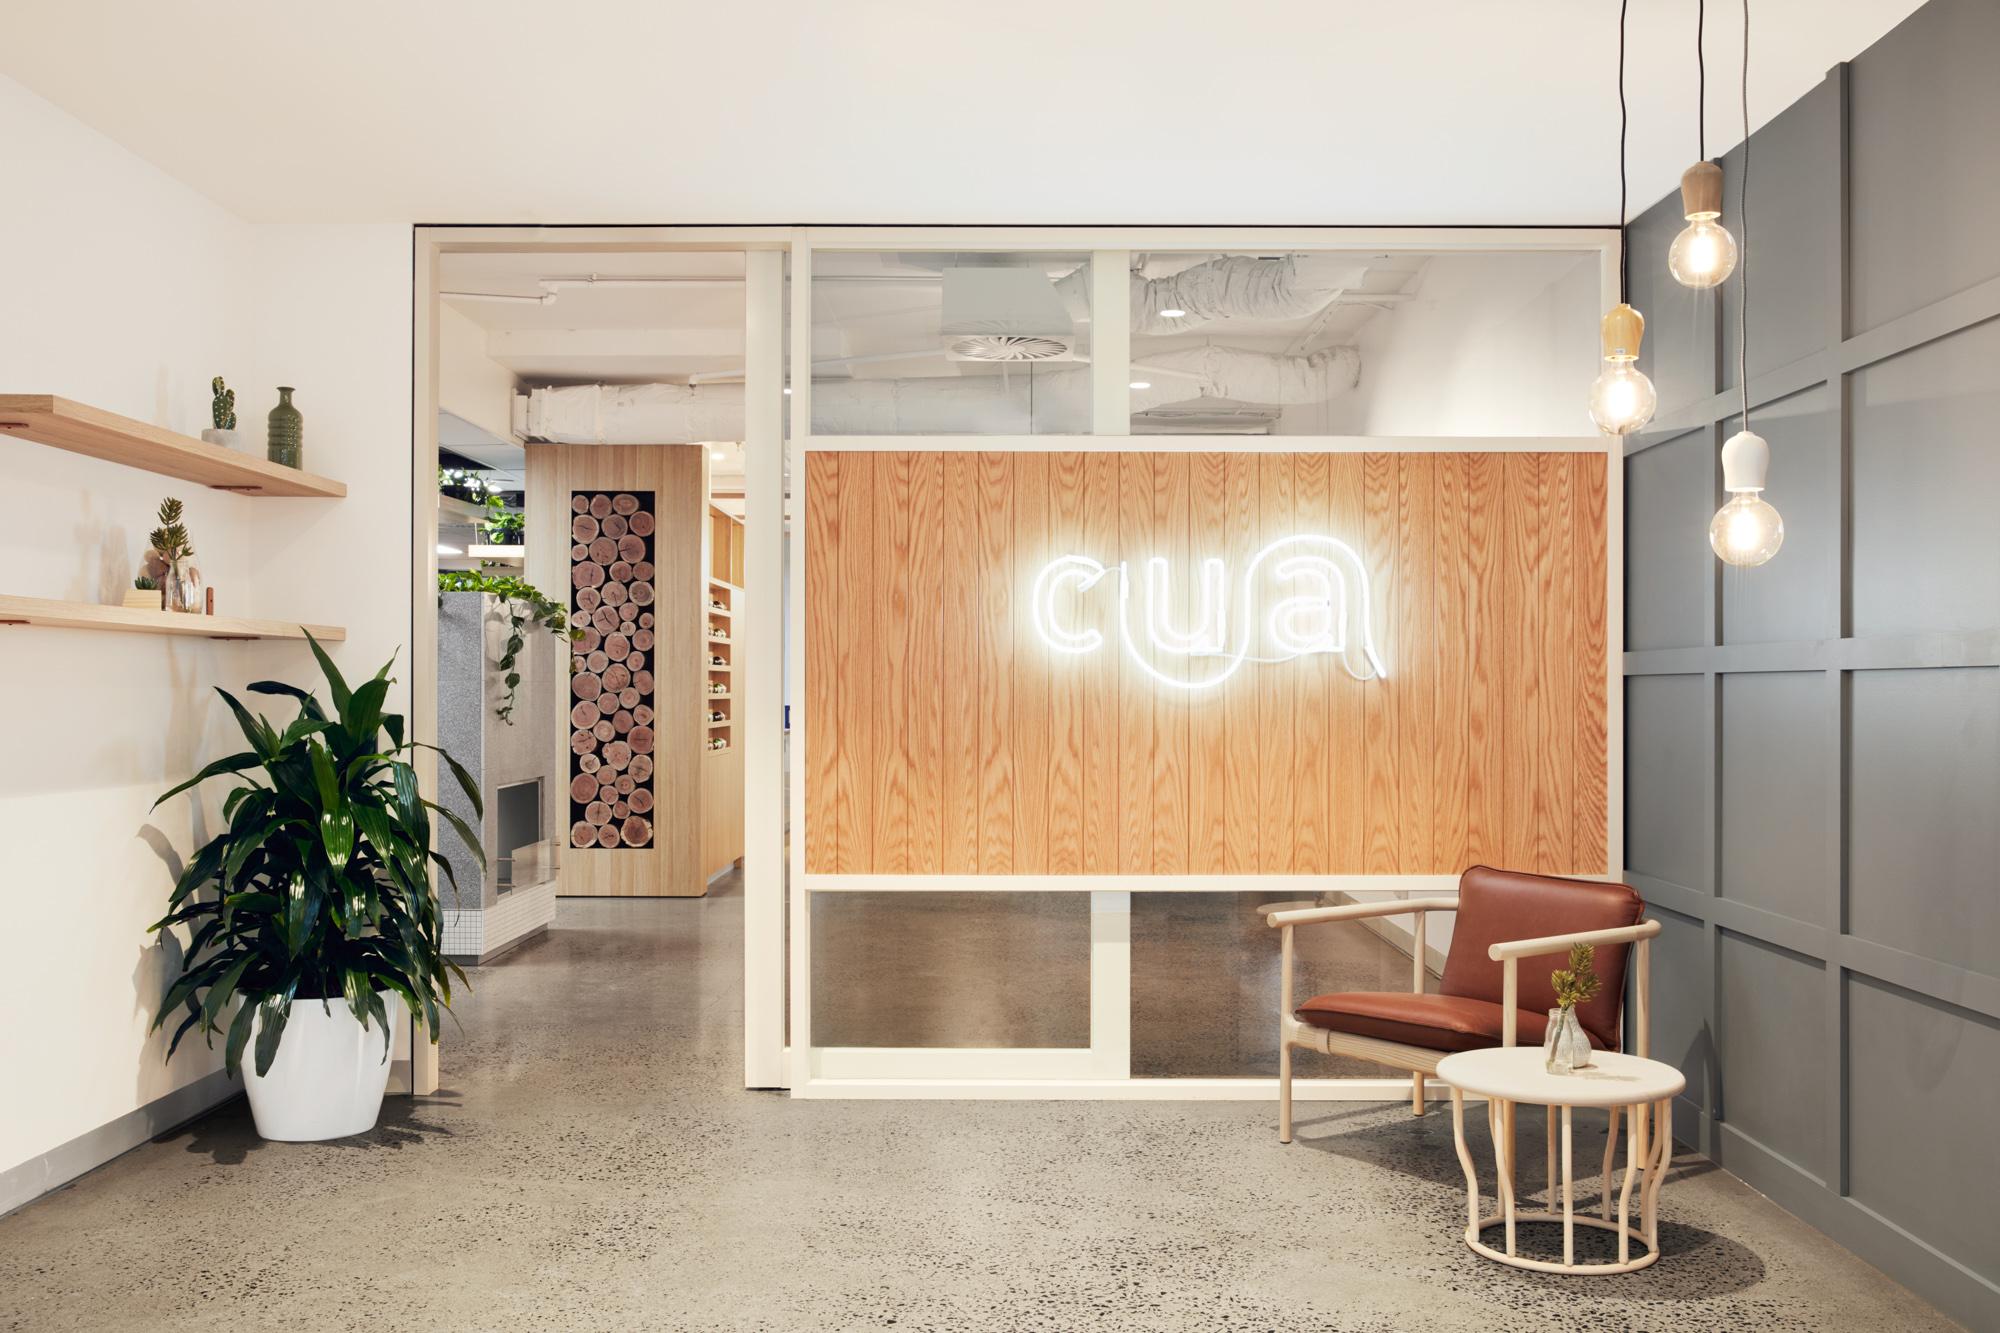 CUA Melbourne by Girvan Waugh in Melbourne, VIC, Australia